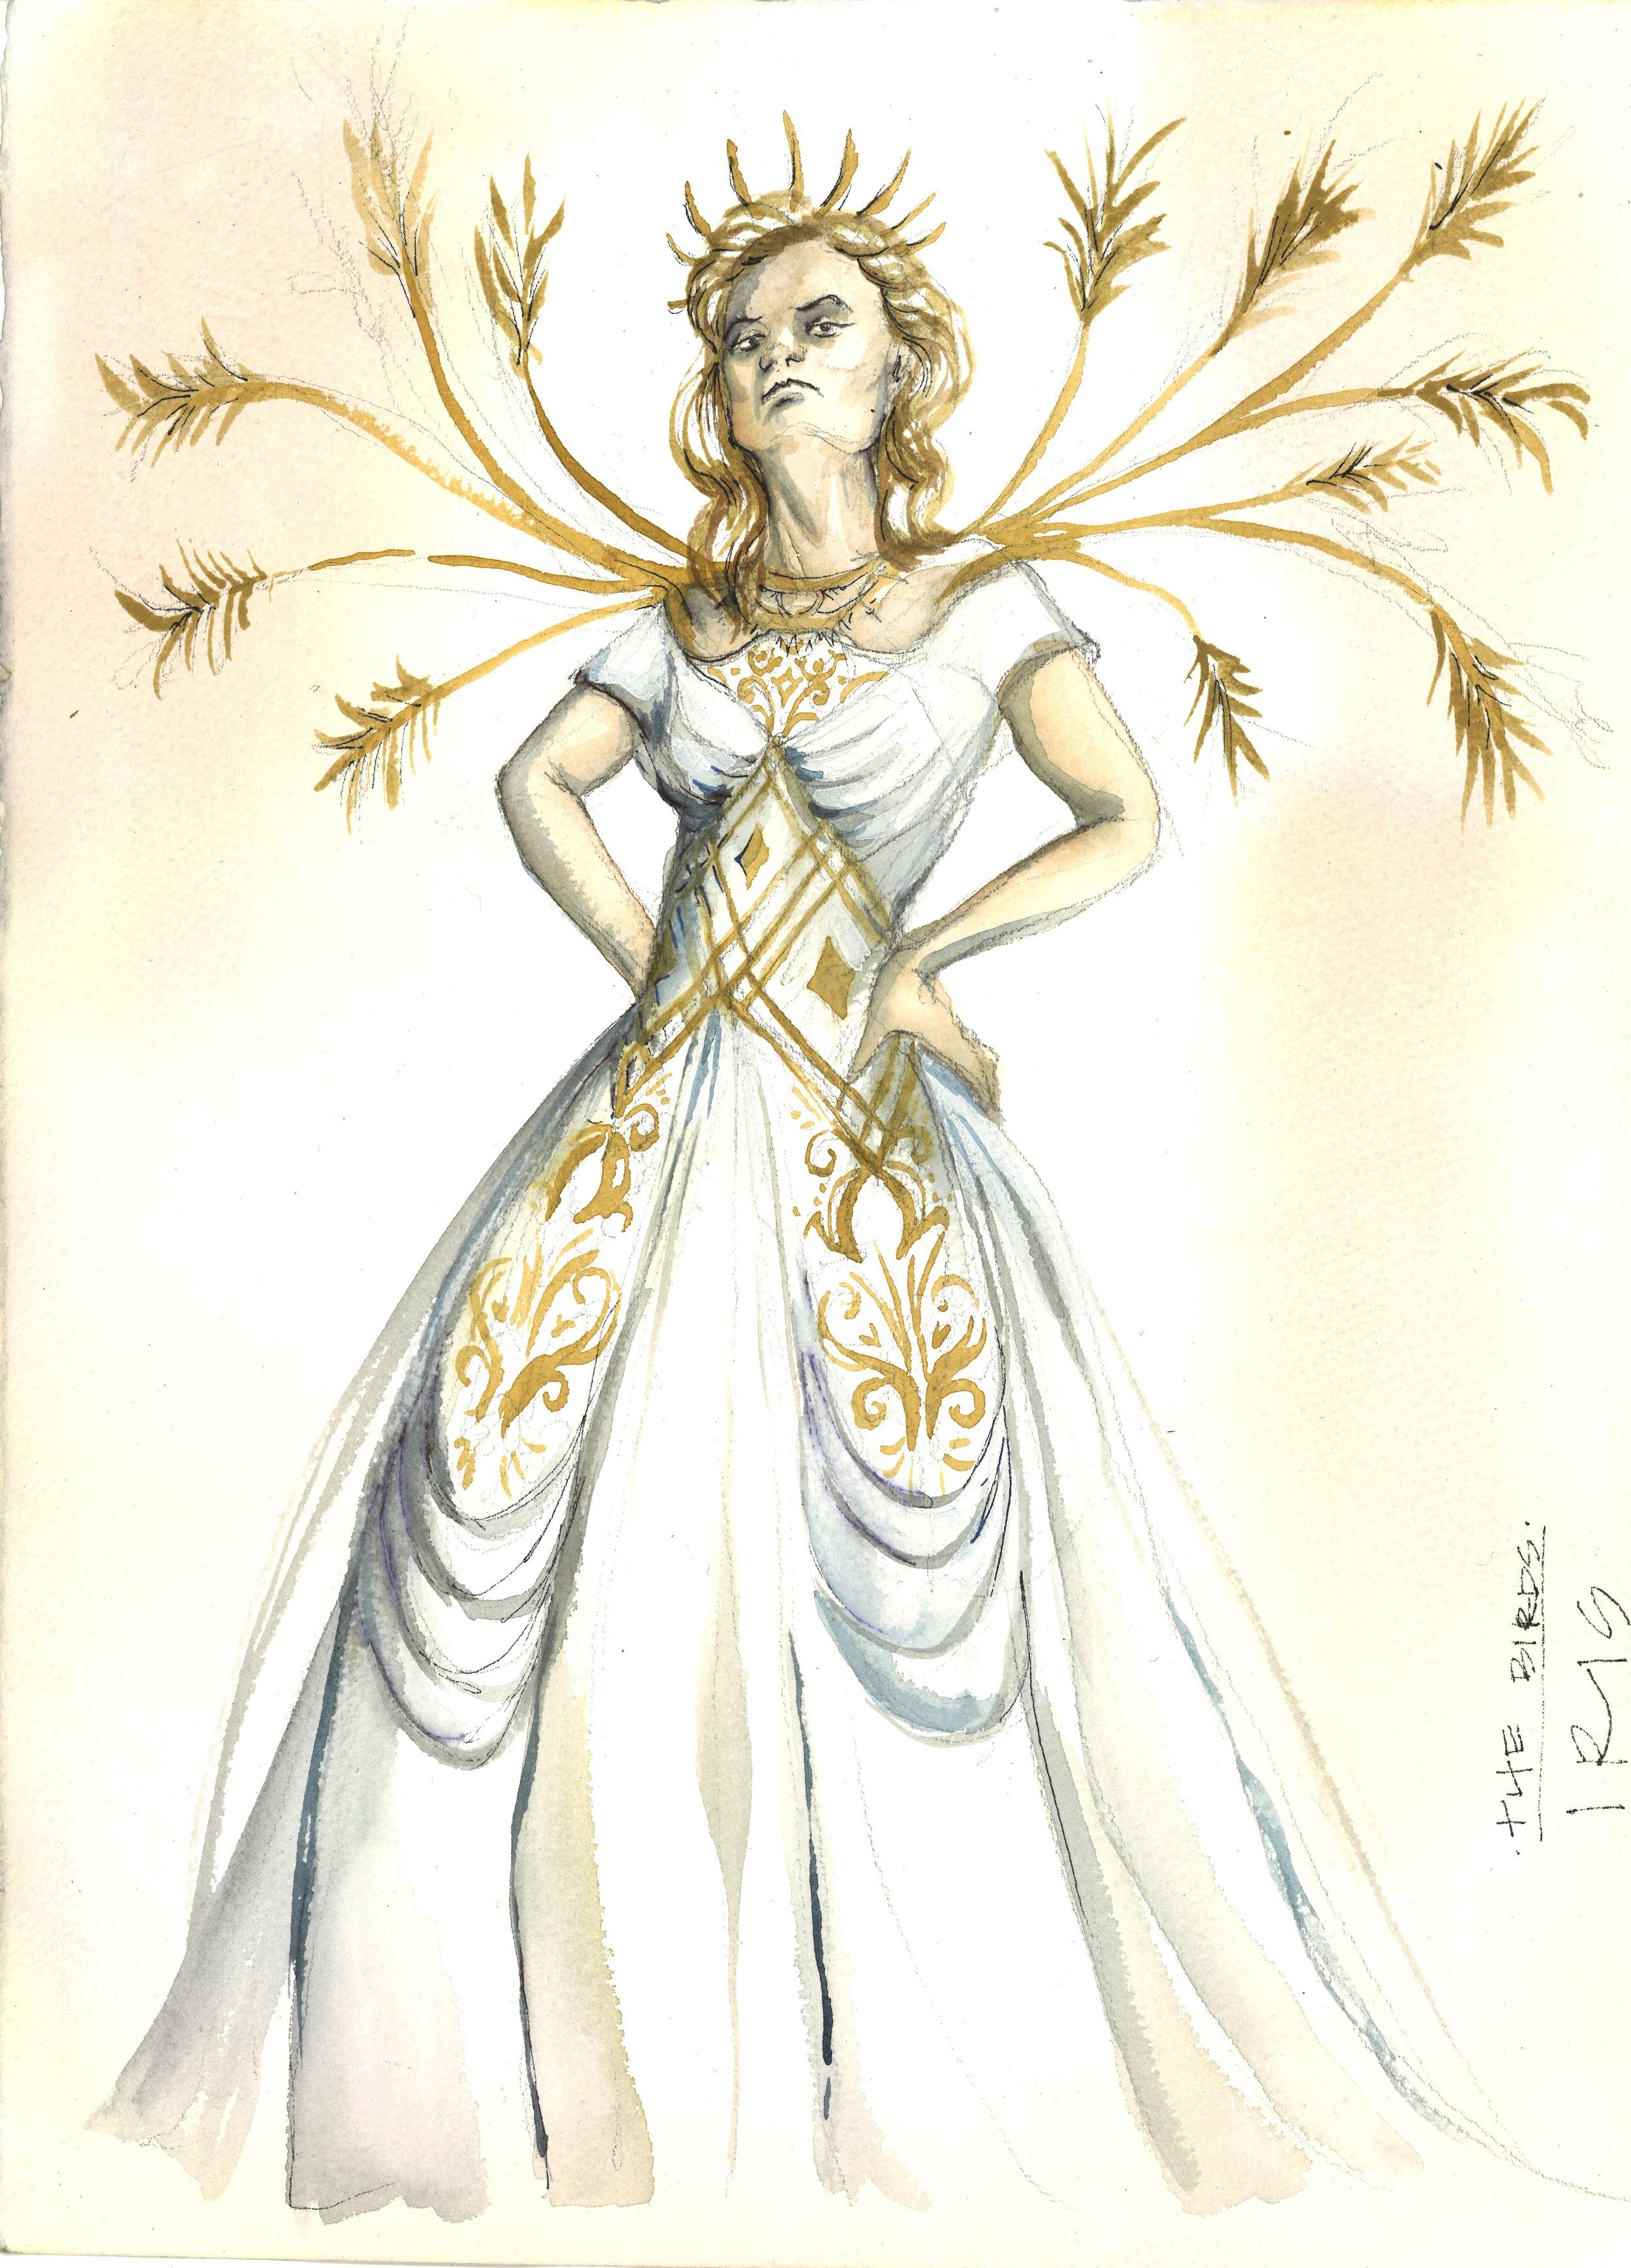 Iris, the Goddess